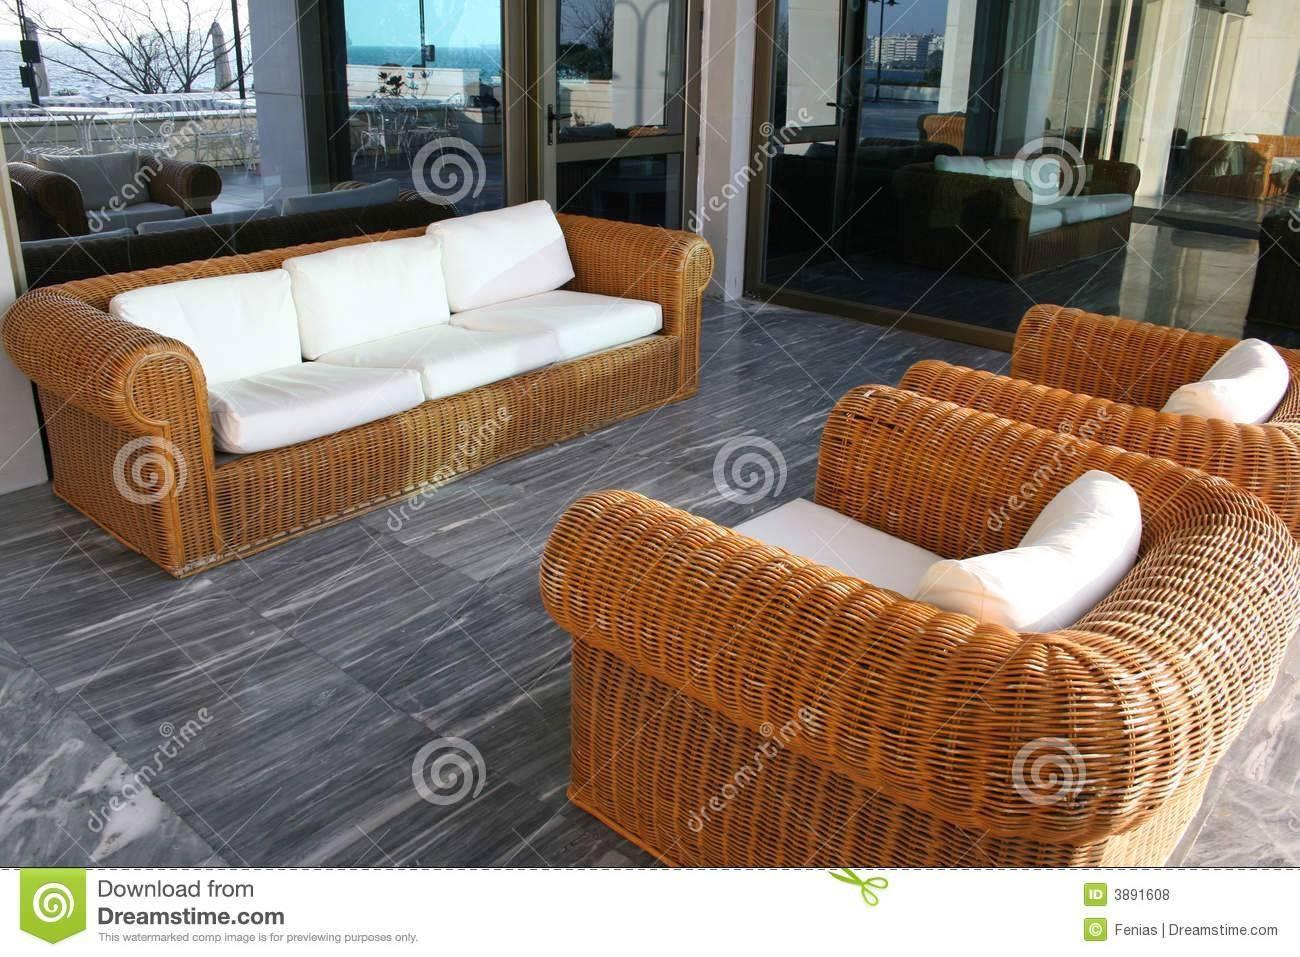 Bamboo Sofa Royalty Free Stock Photos - Image: 3891608 in Bamboo Sofas (Image 3 of 15)